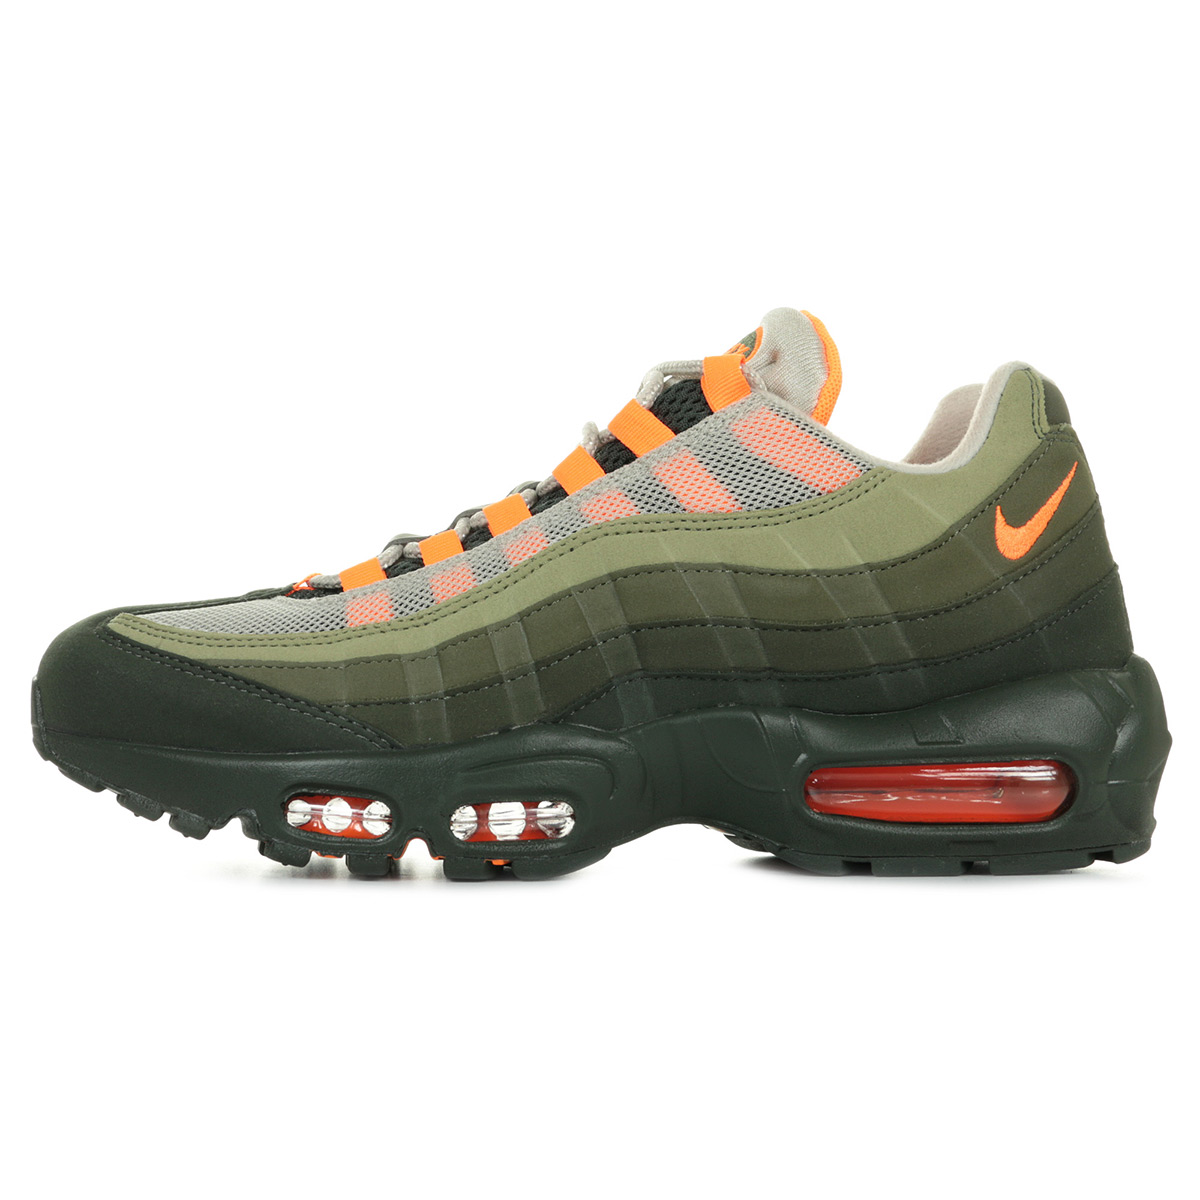 100% authentic e427f 40cf1 Nike Air Max 95 OG